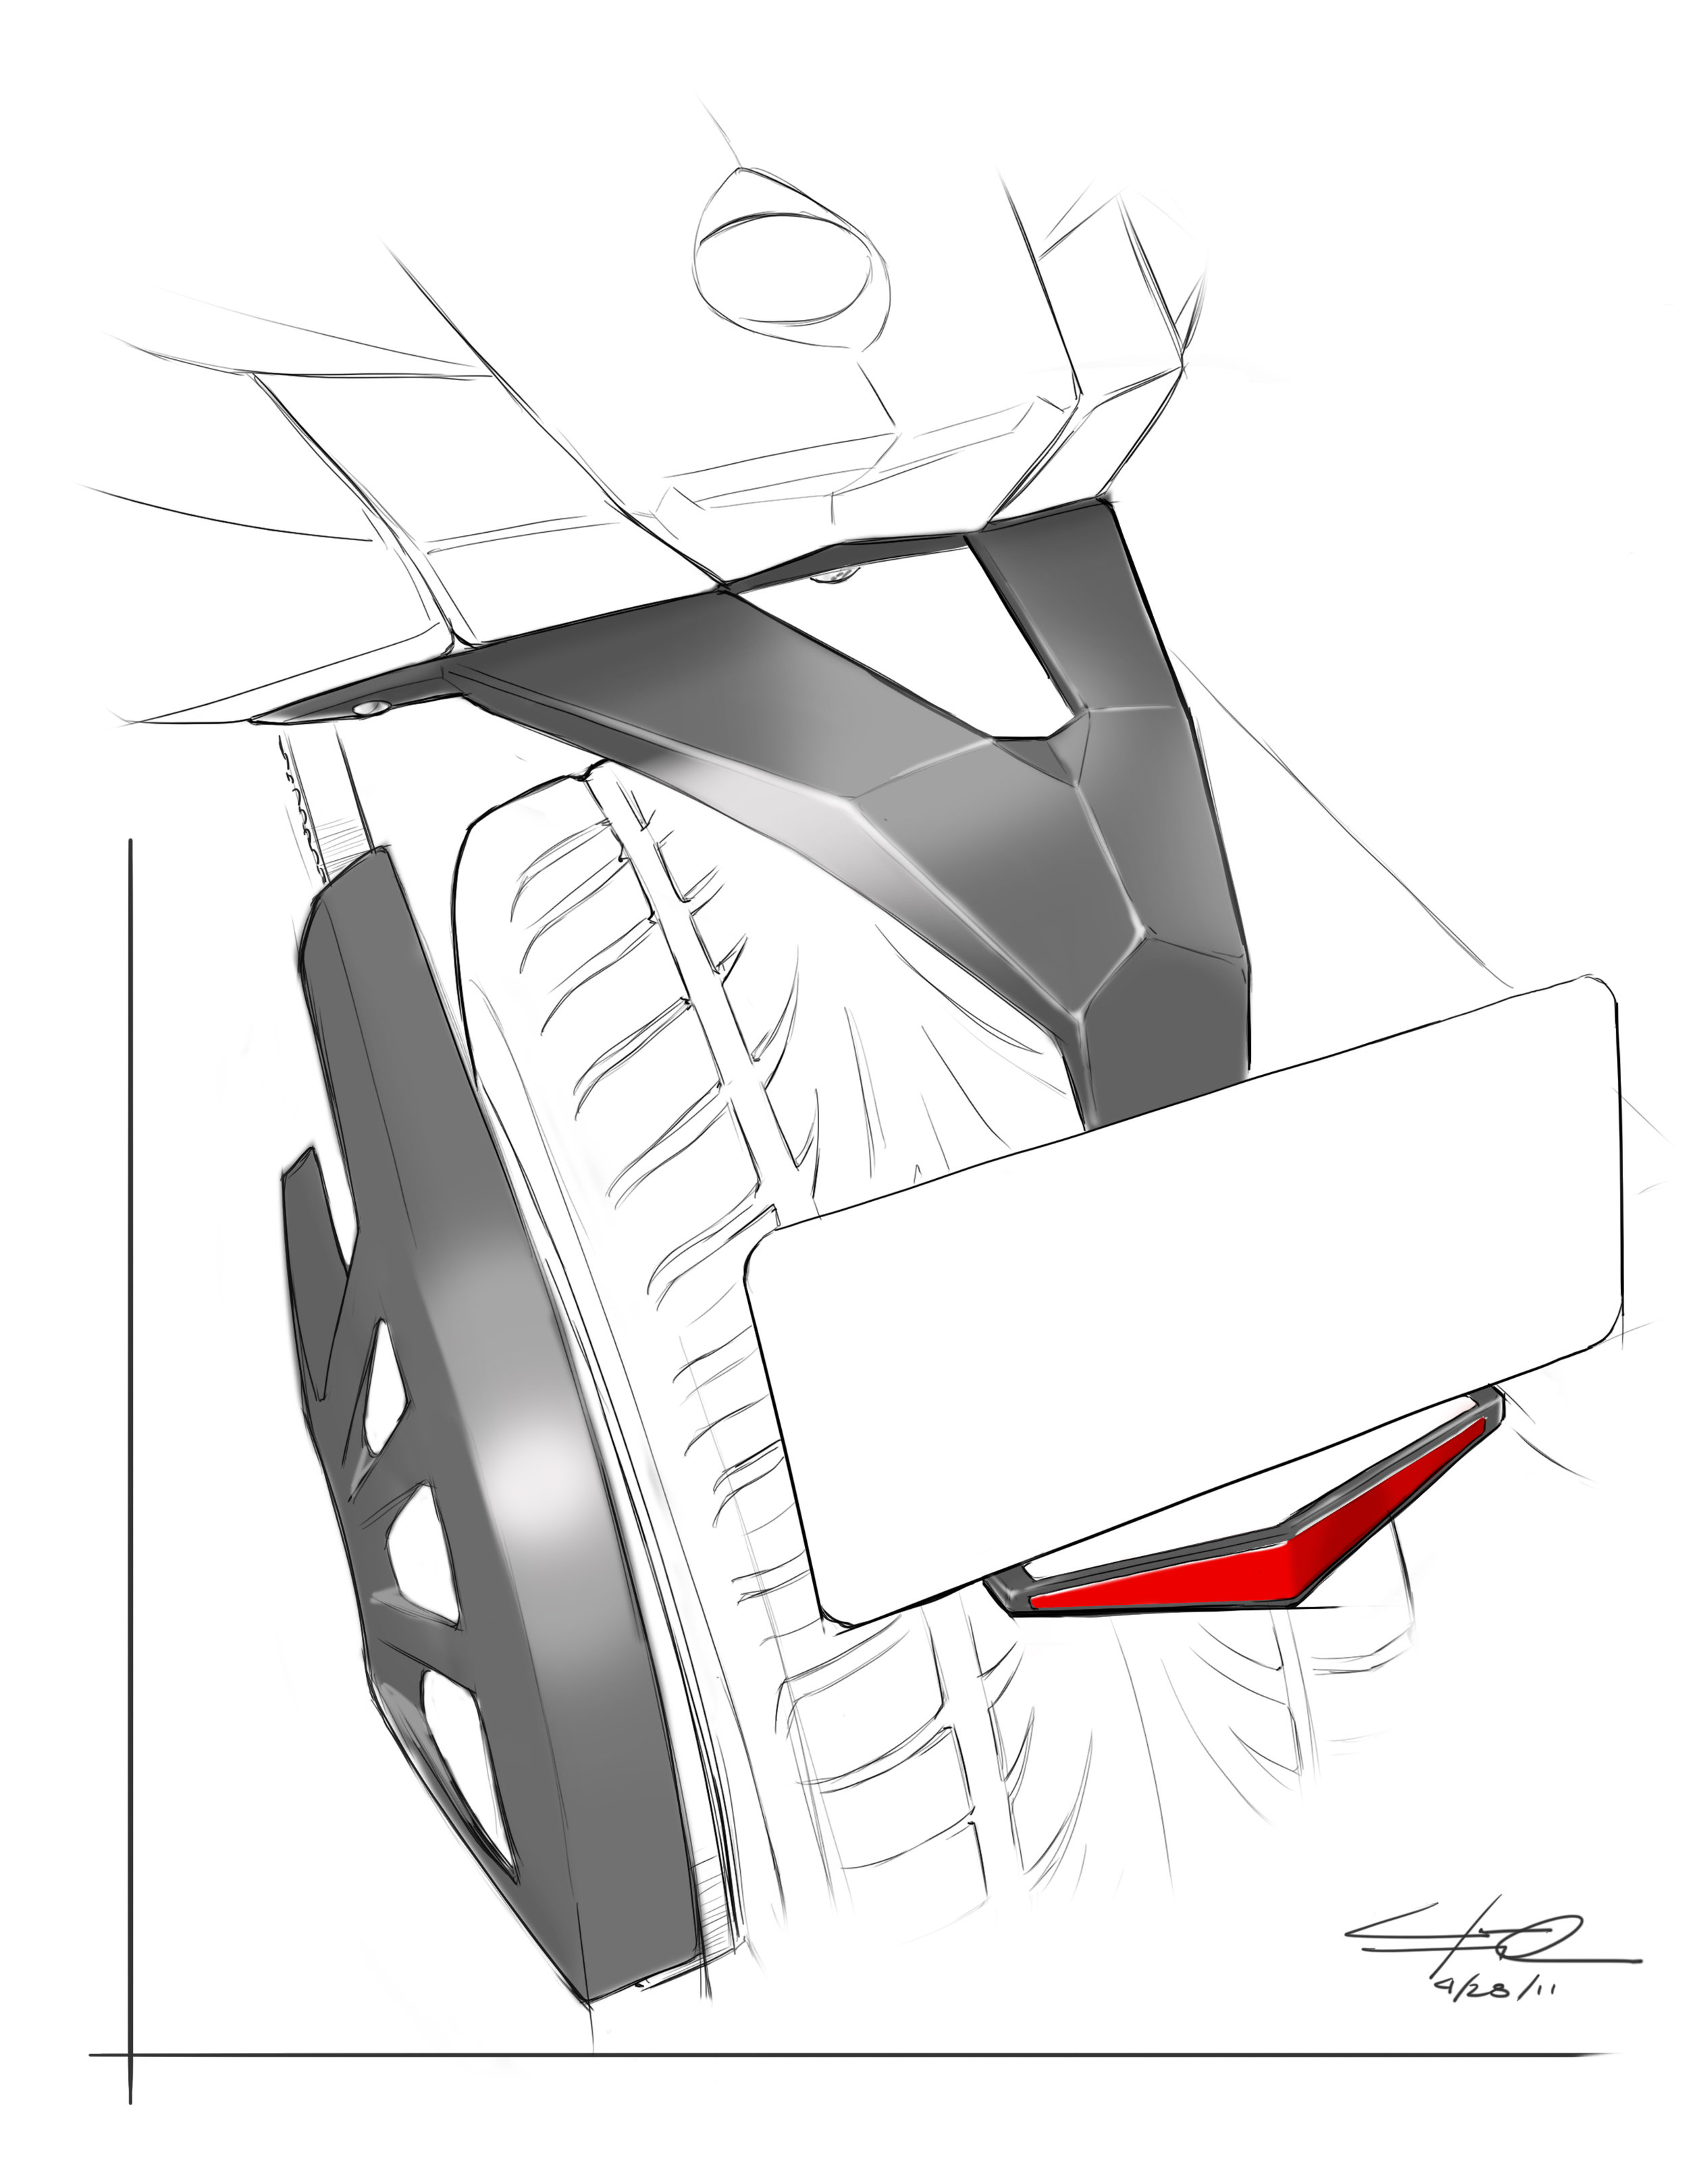 Rear Fender sketches 04282011_A2.jpg